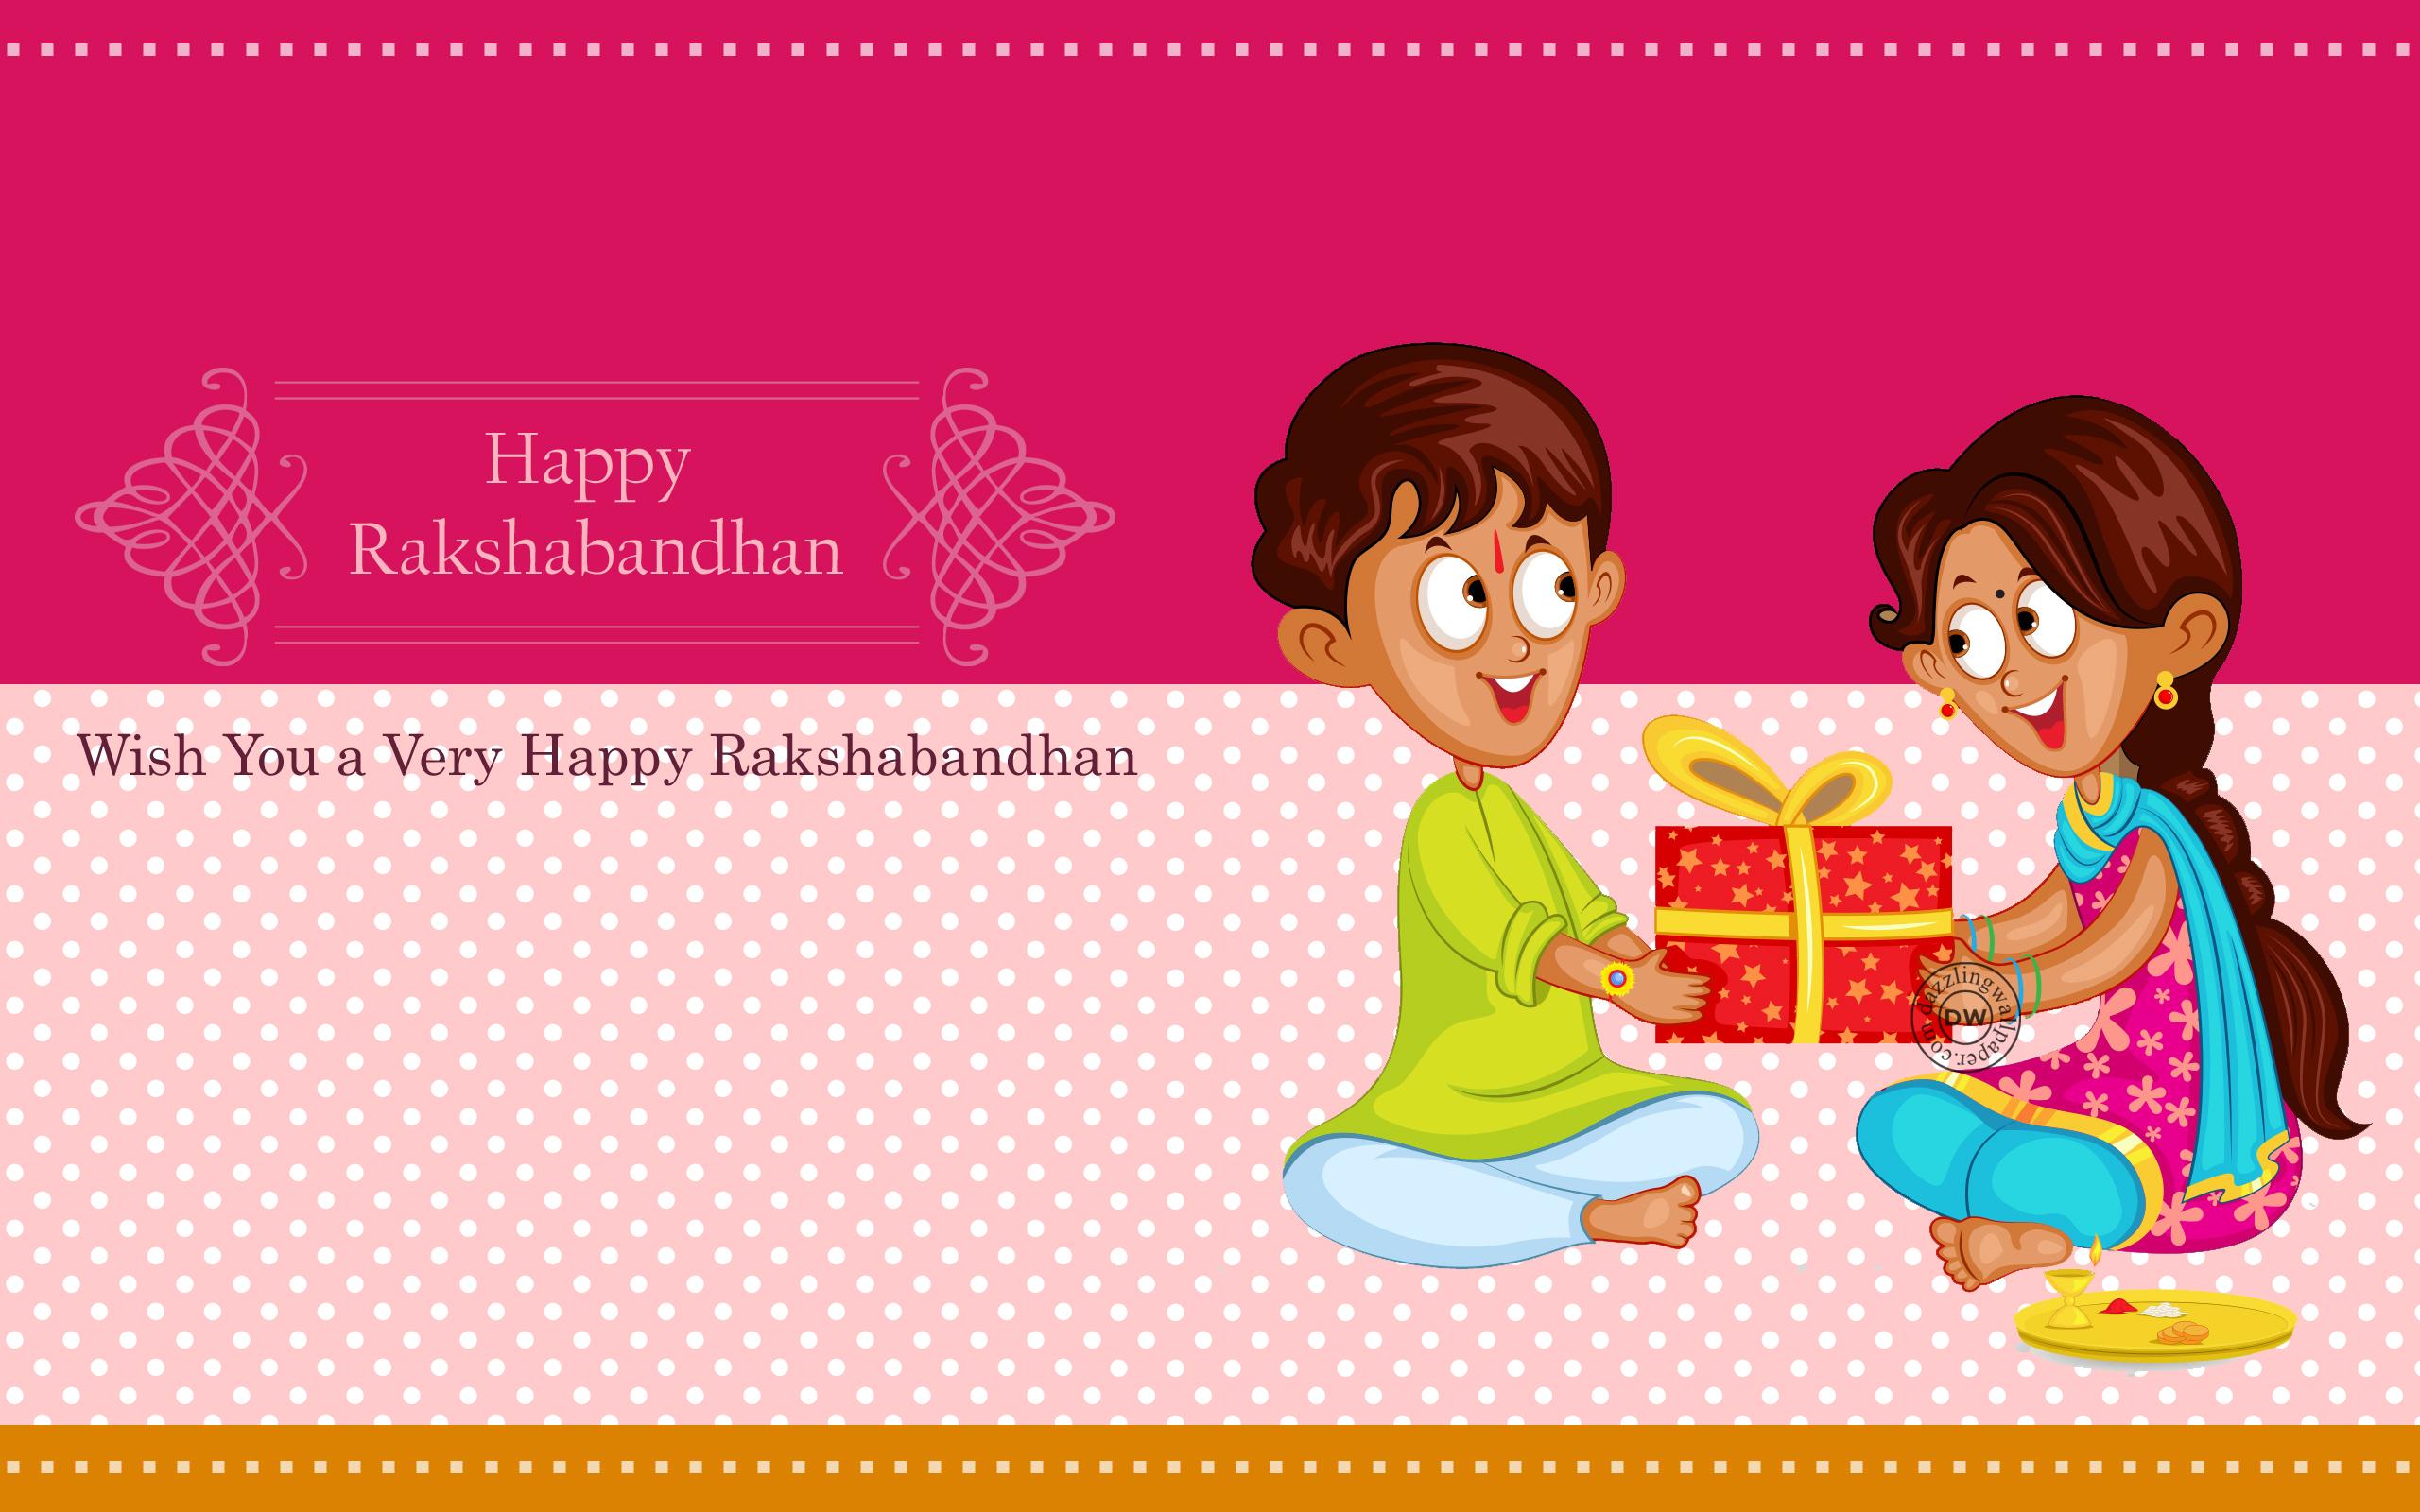 Festival clipart raksha bandhan Wallpaper Rakshabandhan Raksha Happy Wallpaper